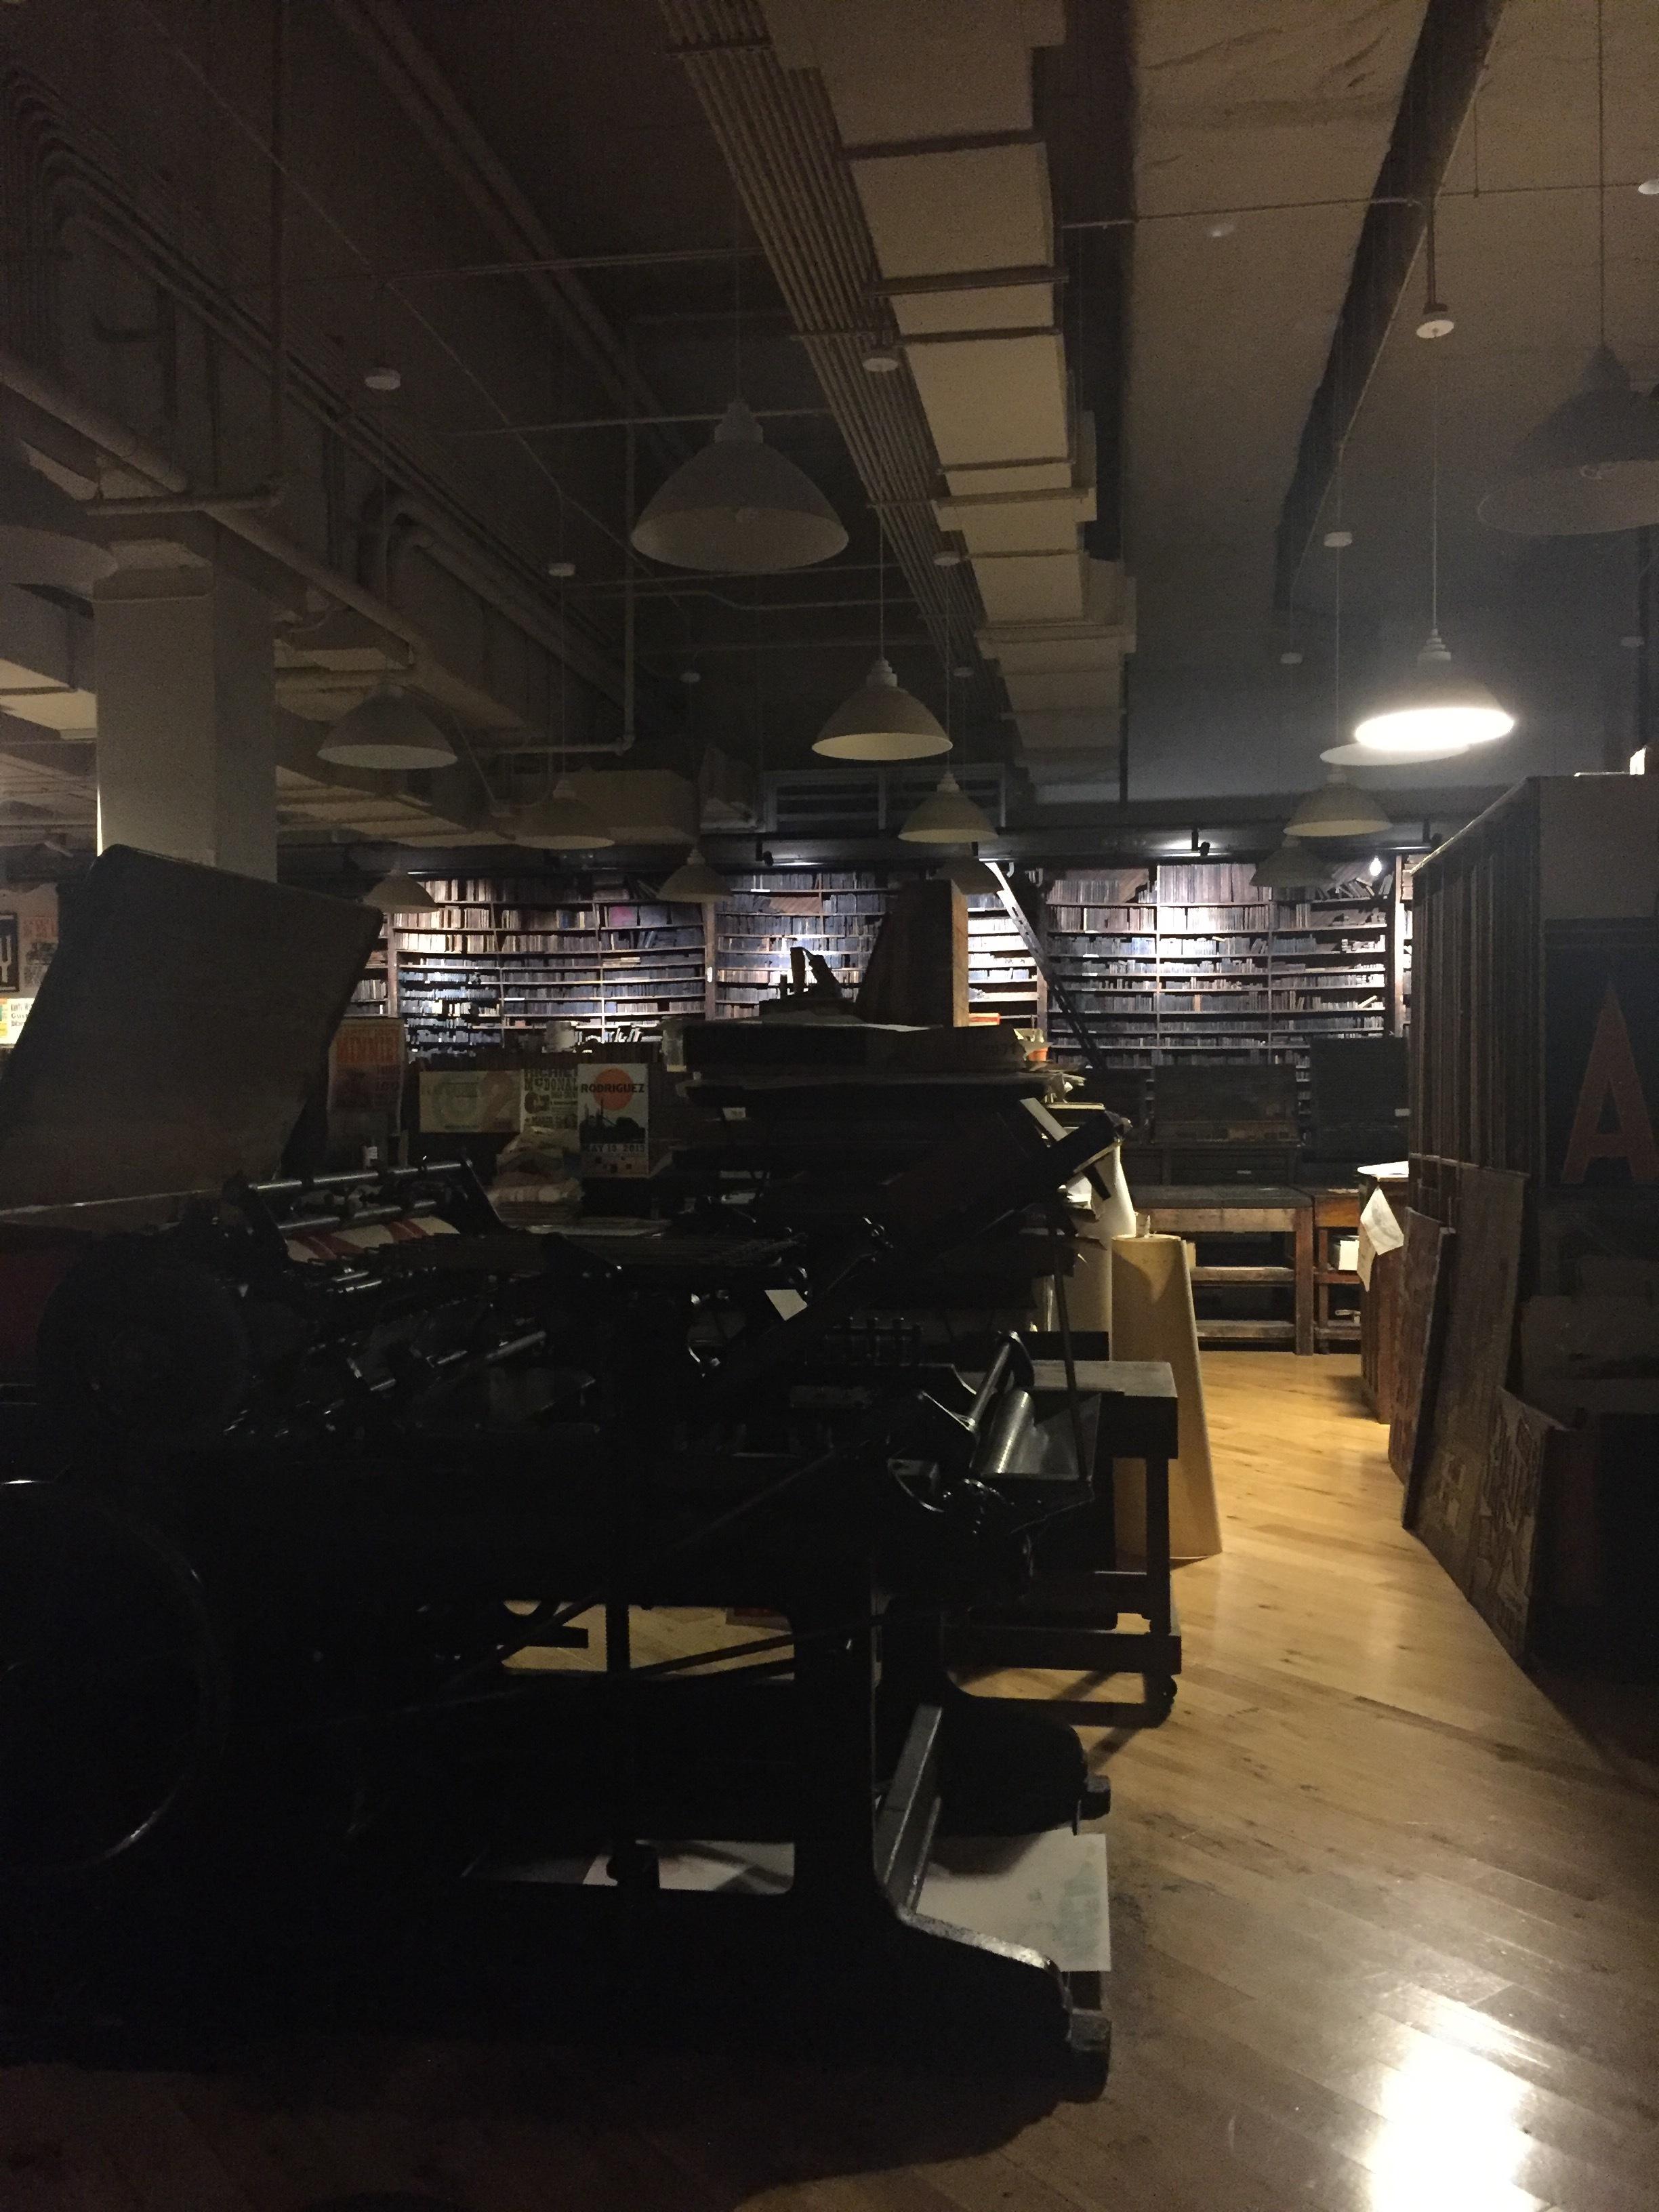 image description: A massive metal letterpress printer in a darkened print shop.